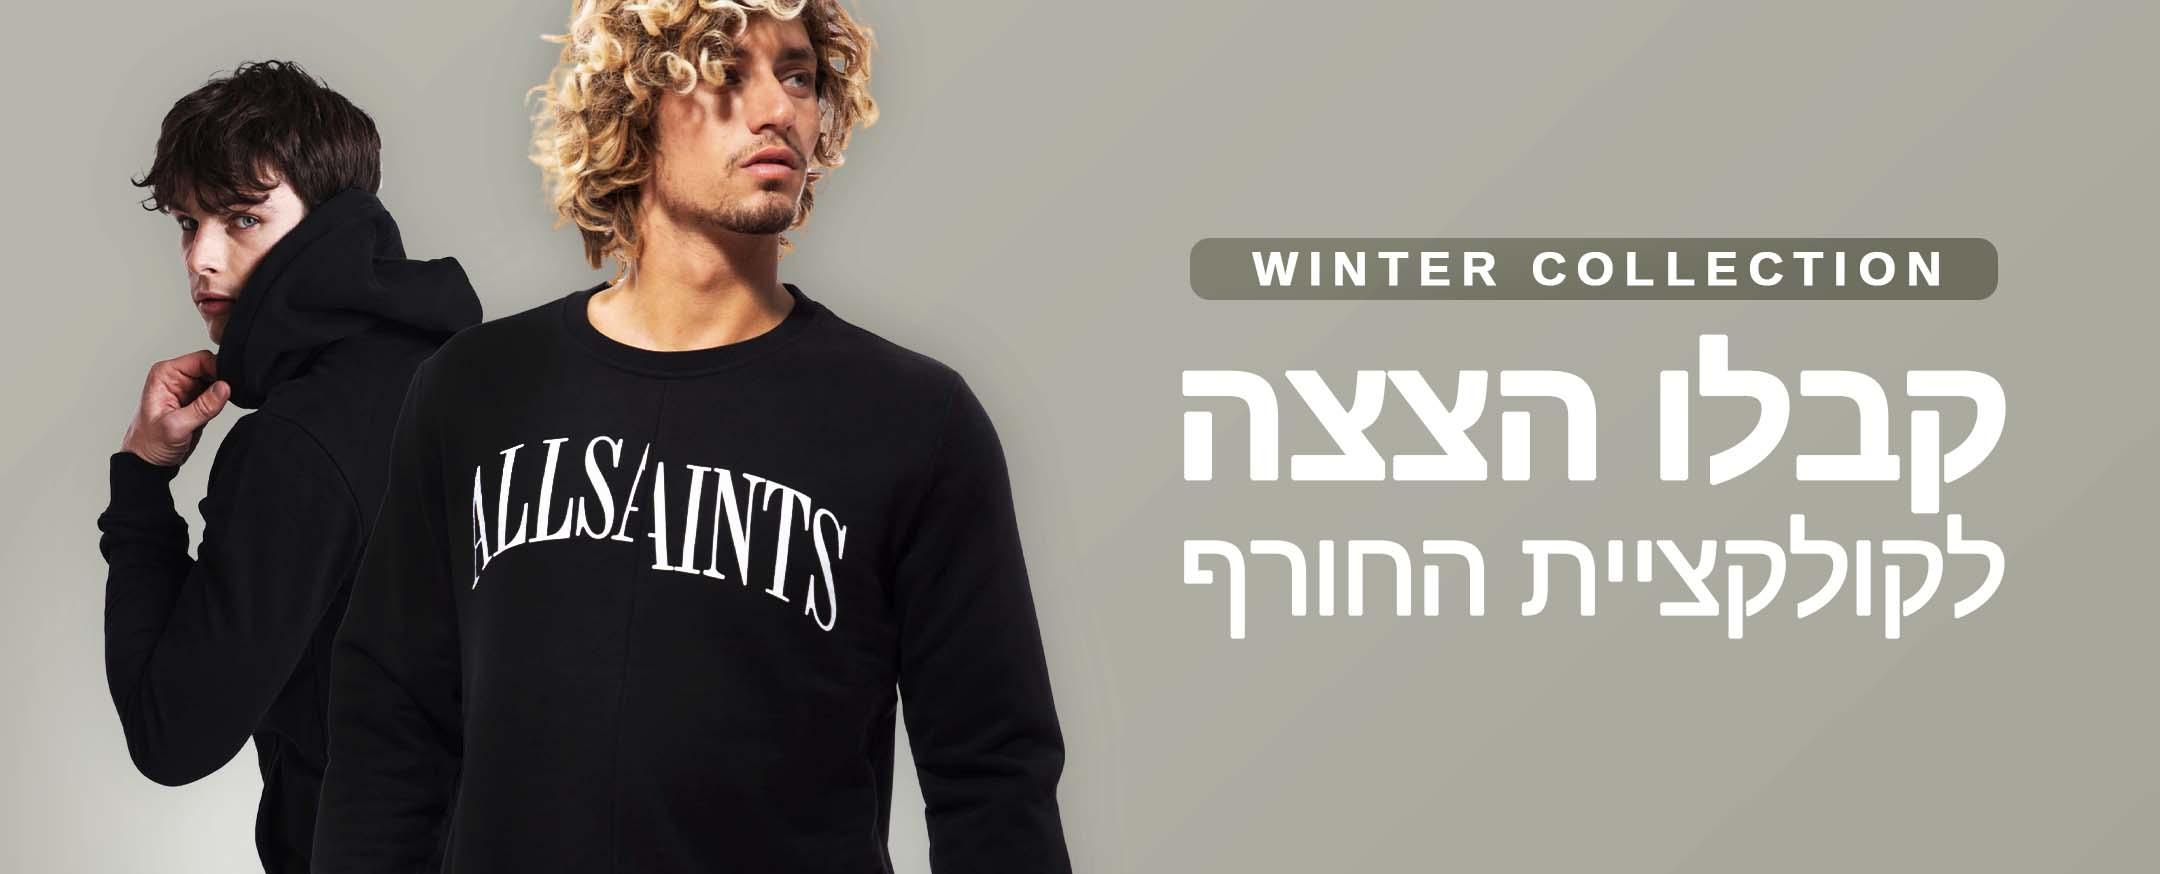 Website_Winter Collection V2